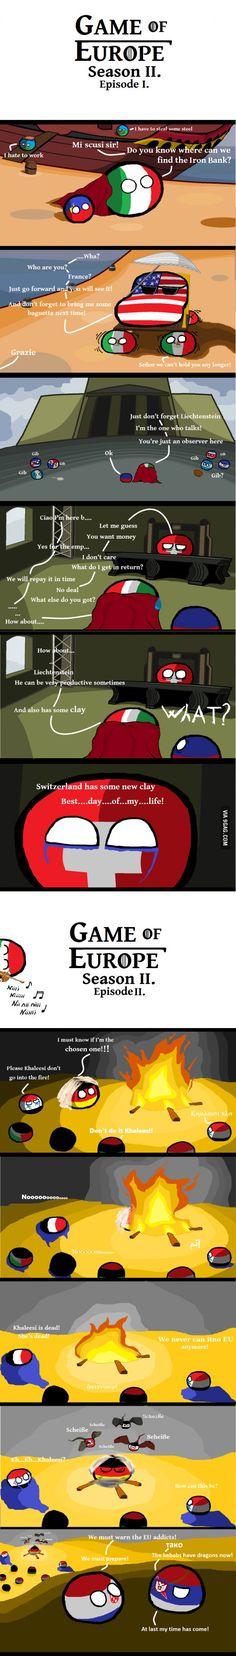 Game of Europe Season II.